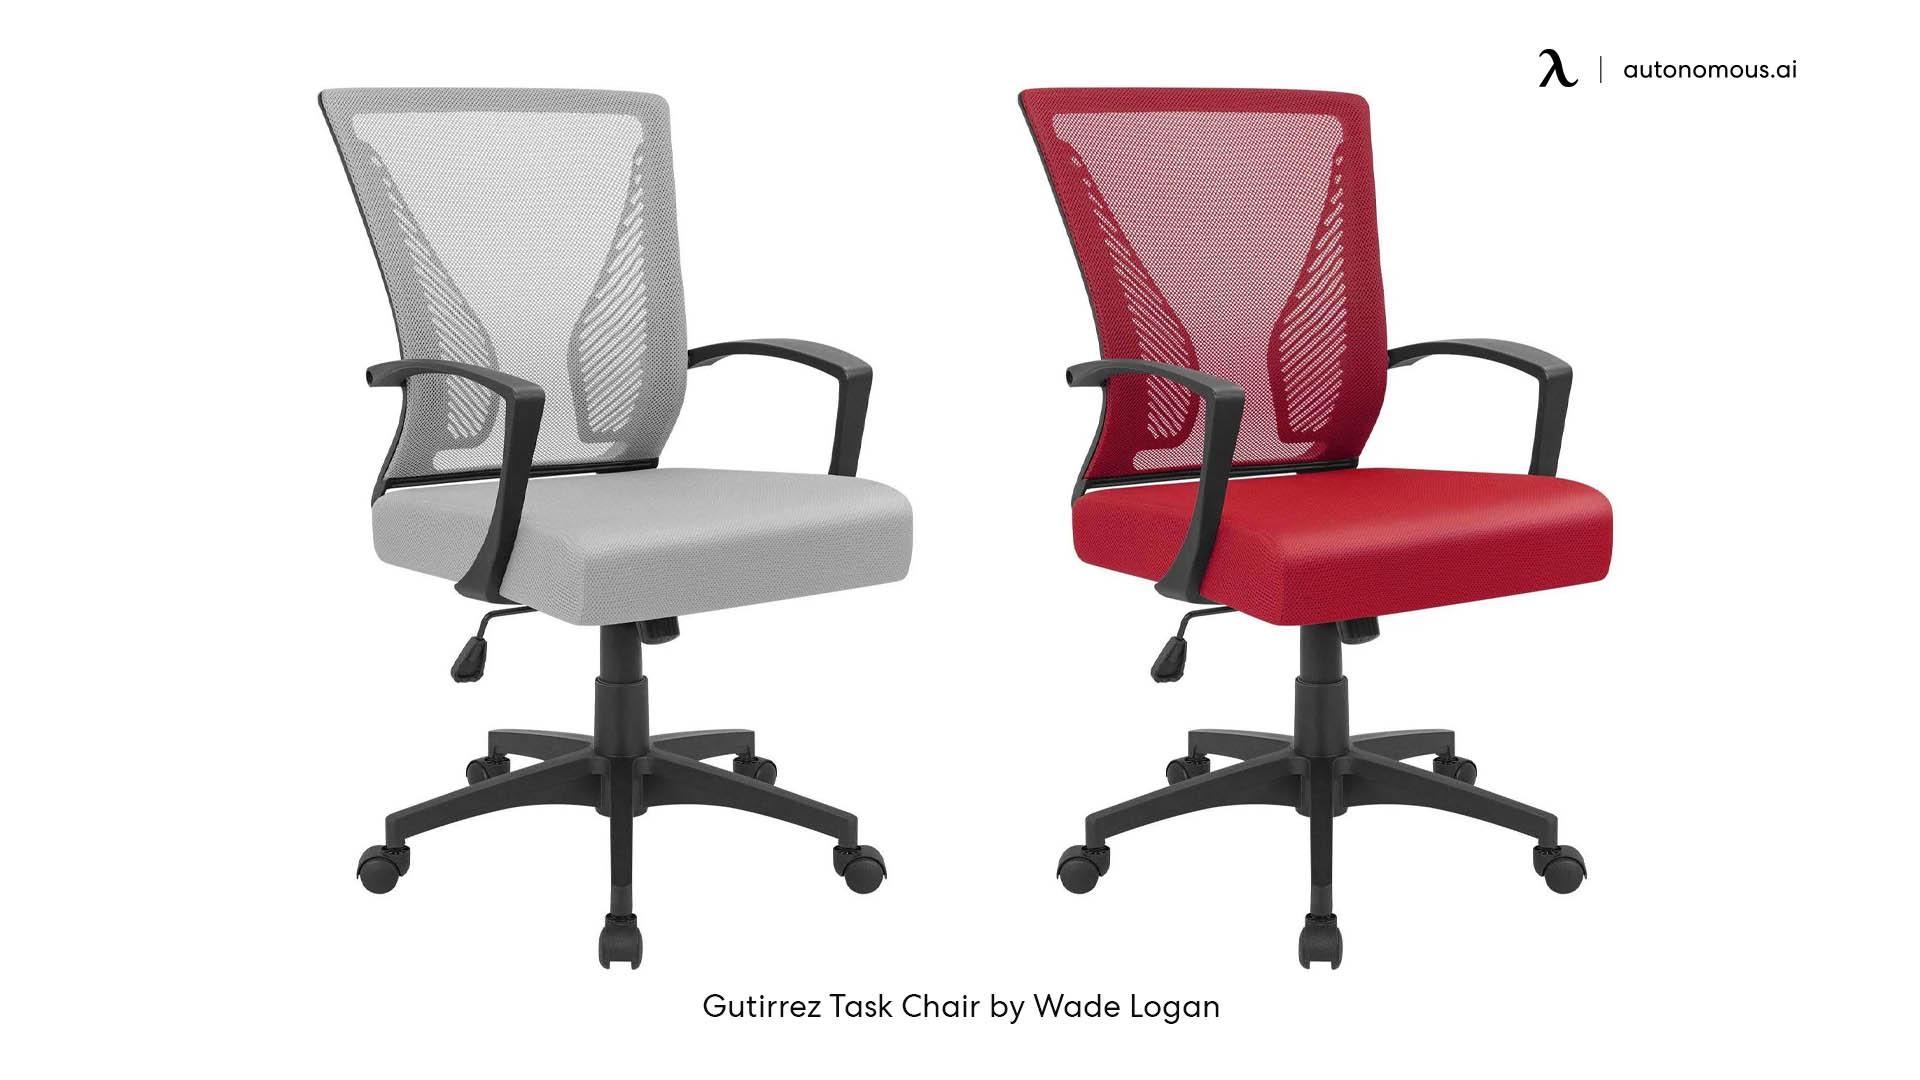 Gutirrez Task Chair by Wade Logan